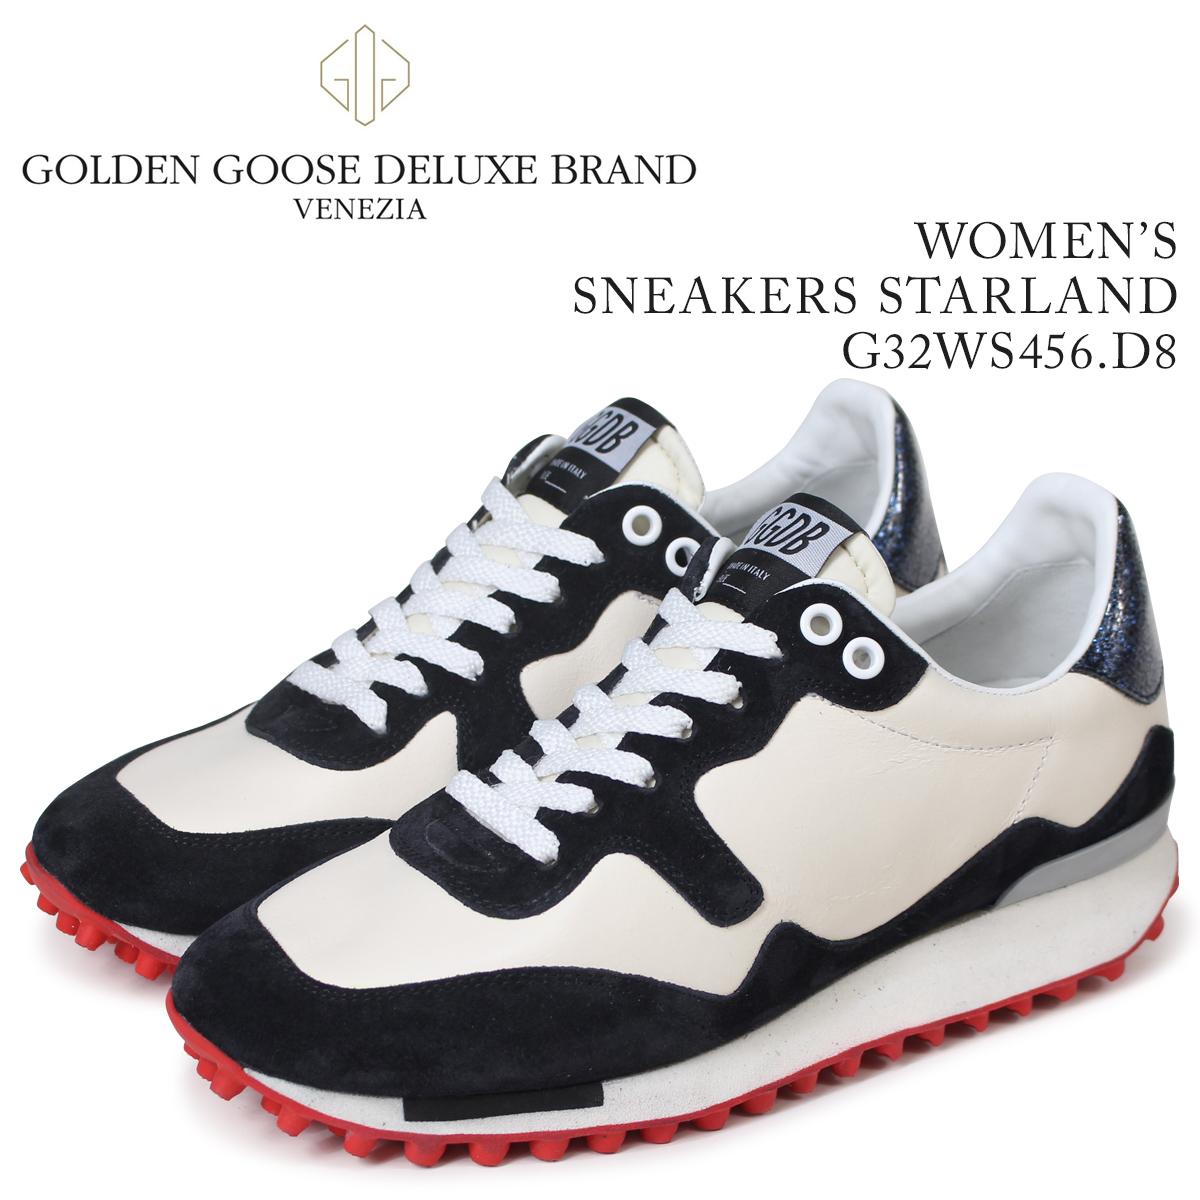 Golden Goose ゴールデングース スニーカー レディース スニーカーズ スターランド SNEAKERS STARLAND グレー G32WS456 D8